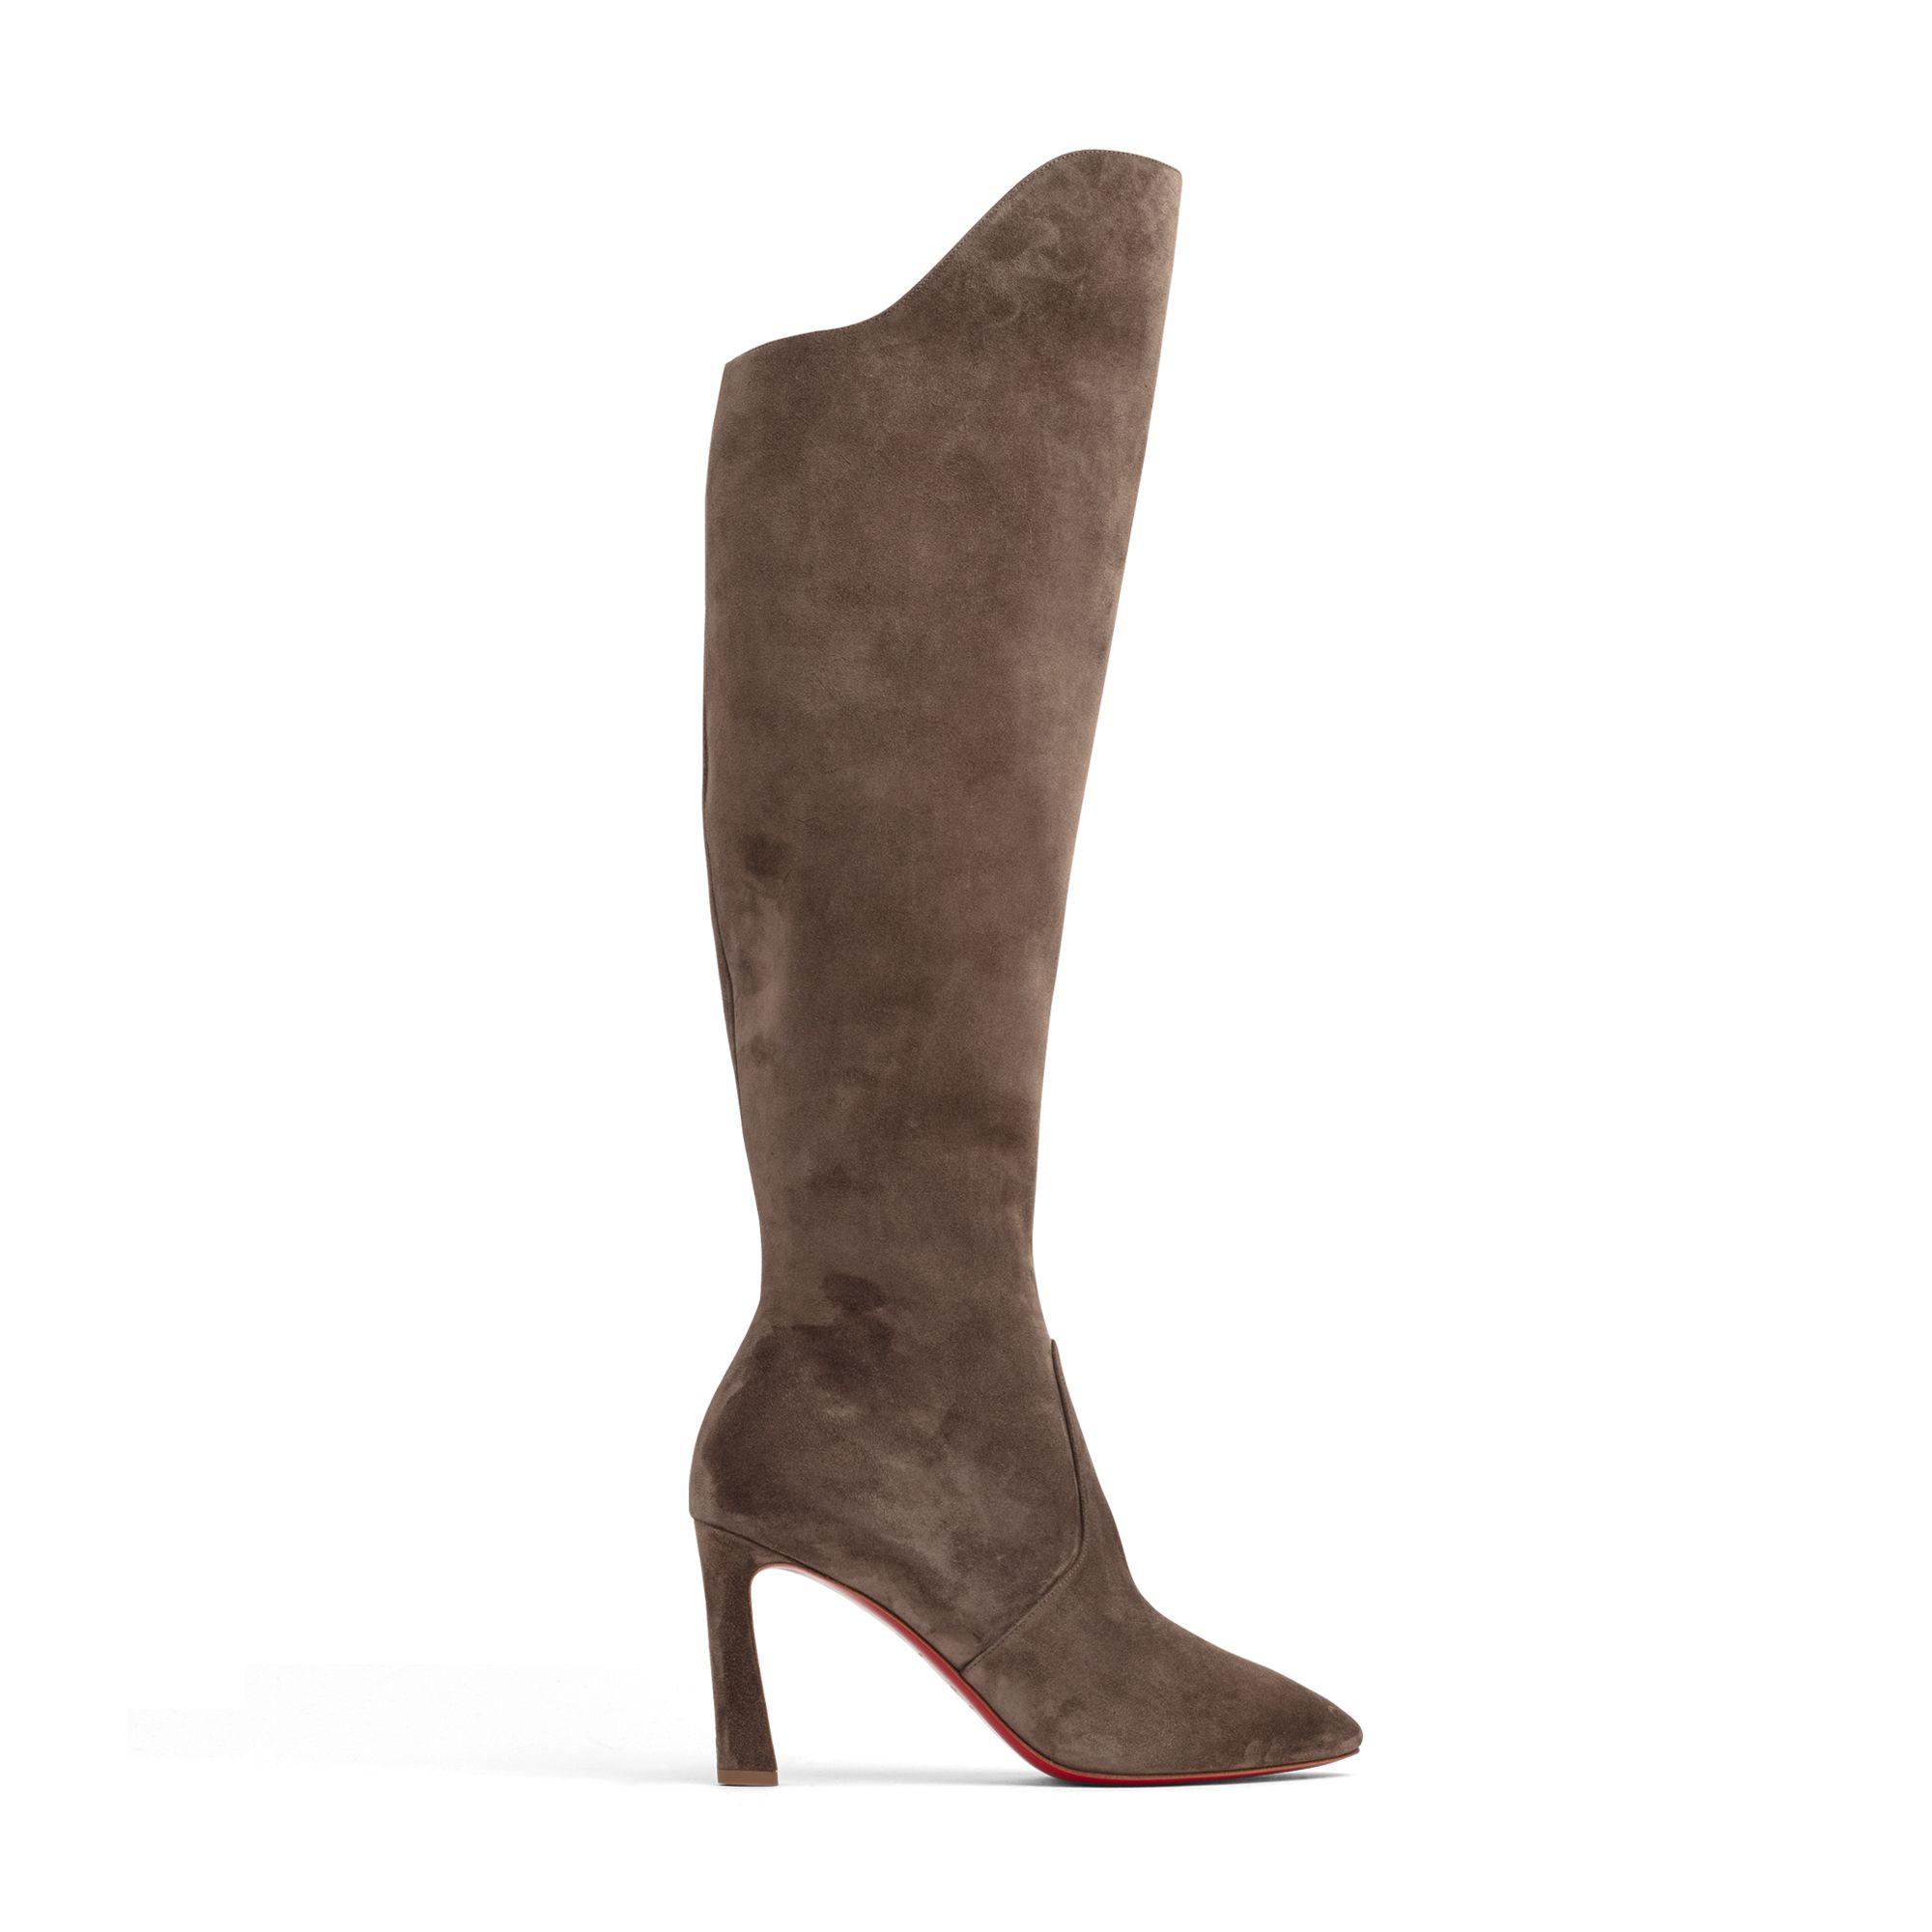 Eleonor Botta 85 boots